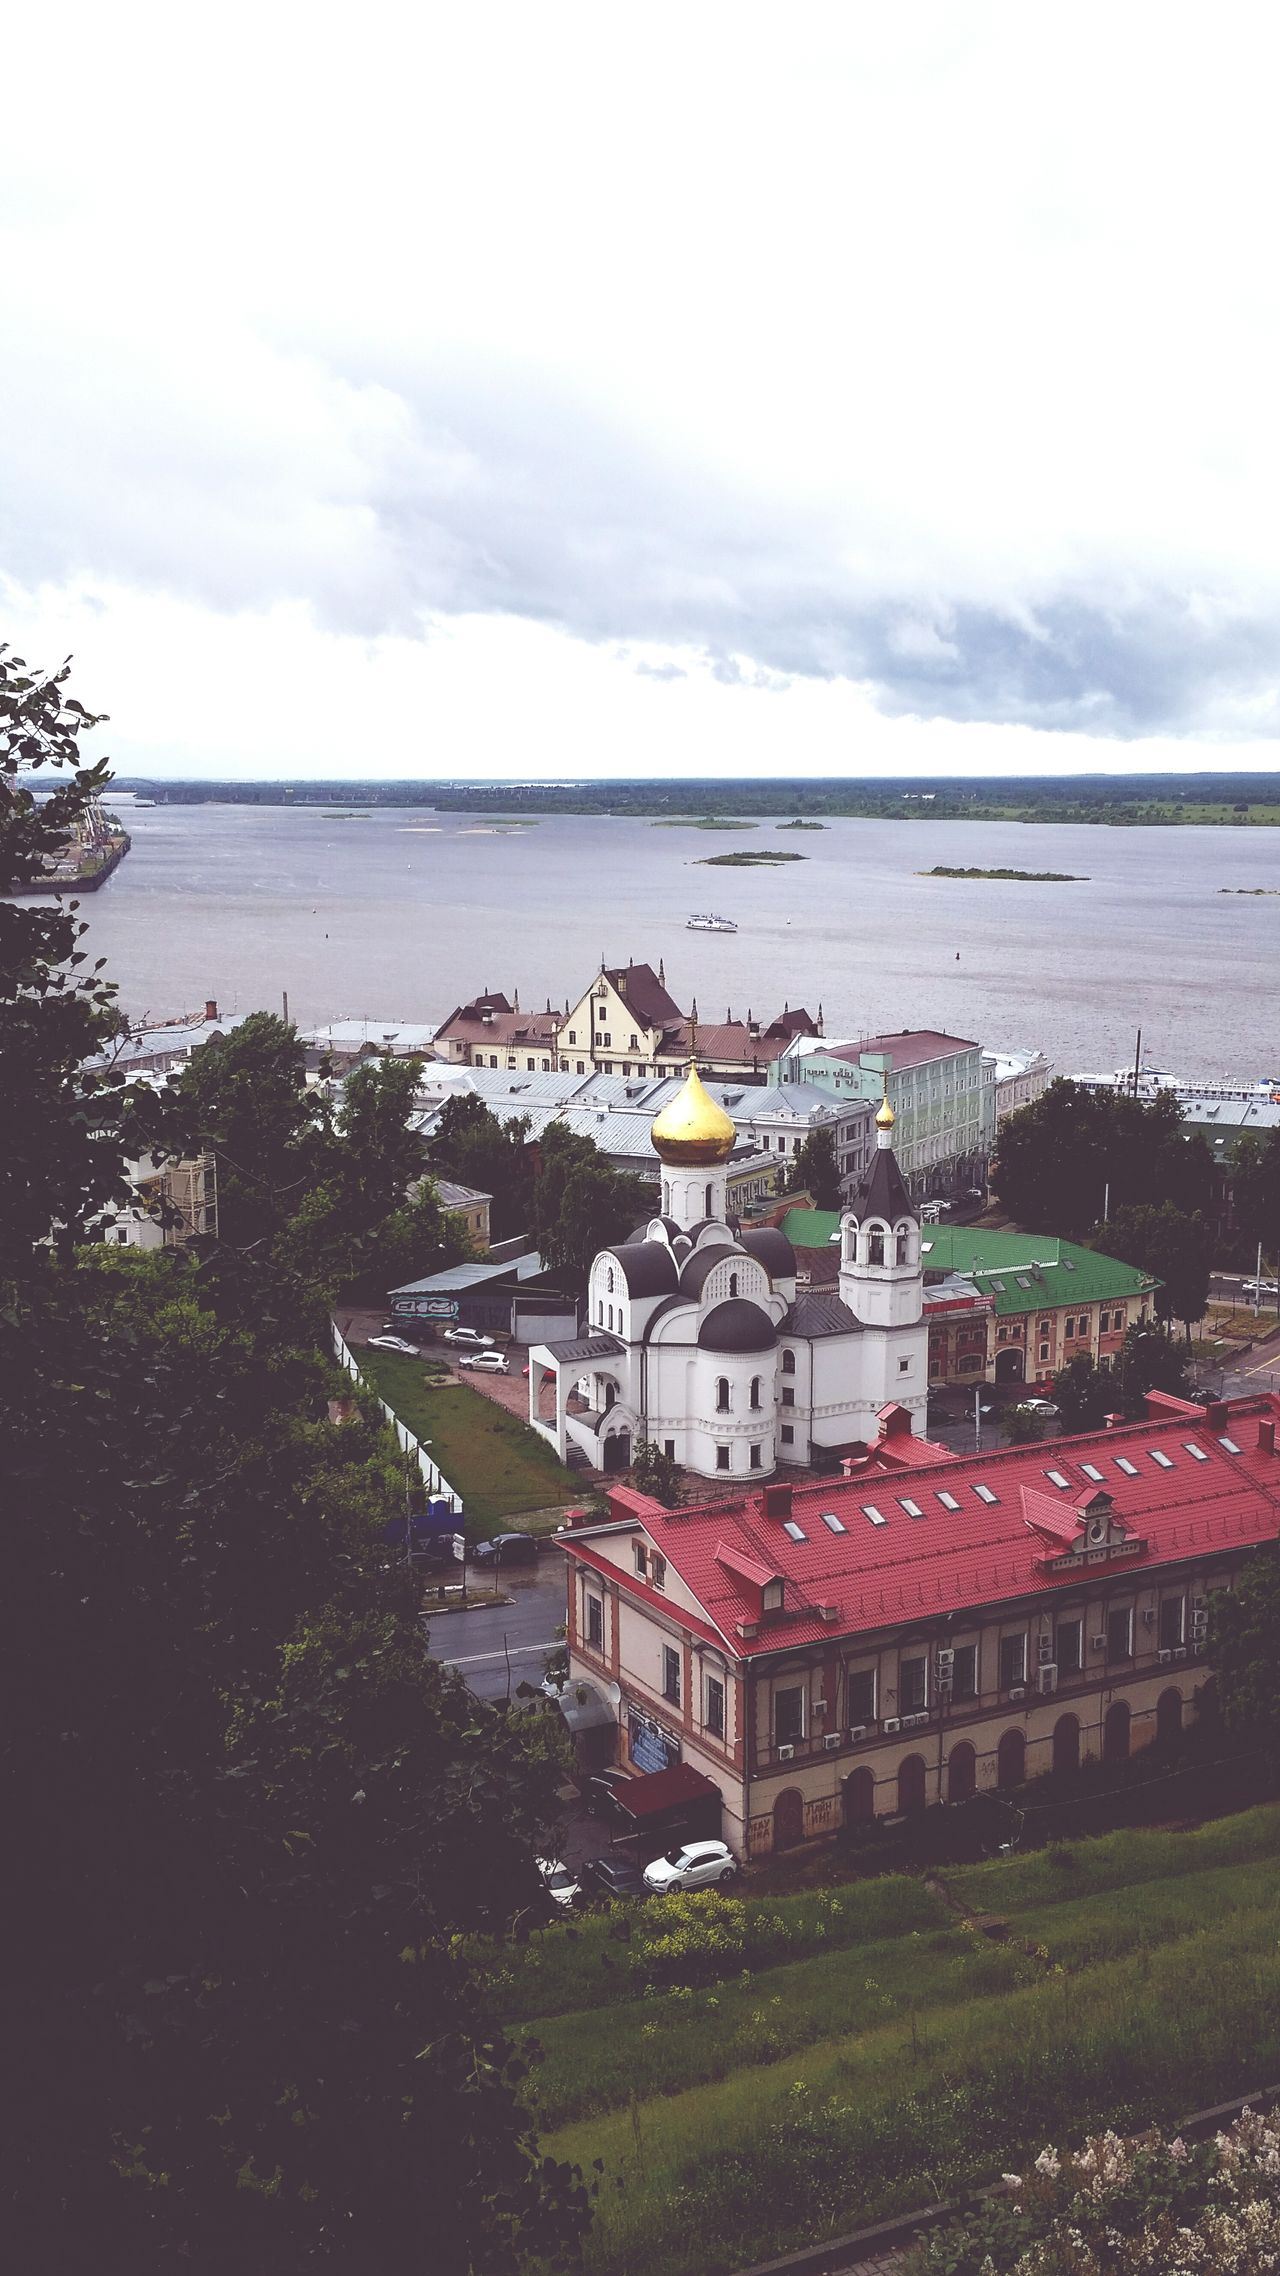 В НижнийНовгород Россия Taking Photos City Hi! место Relaxing Panaramic Beautiful Nizny Novgorod Russia Photooftheday Nice Day город Life красота Hanging Out Beautiful Day